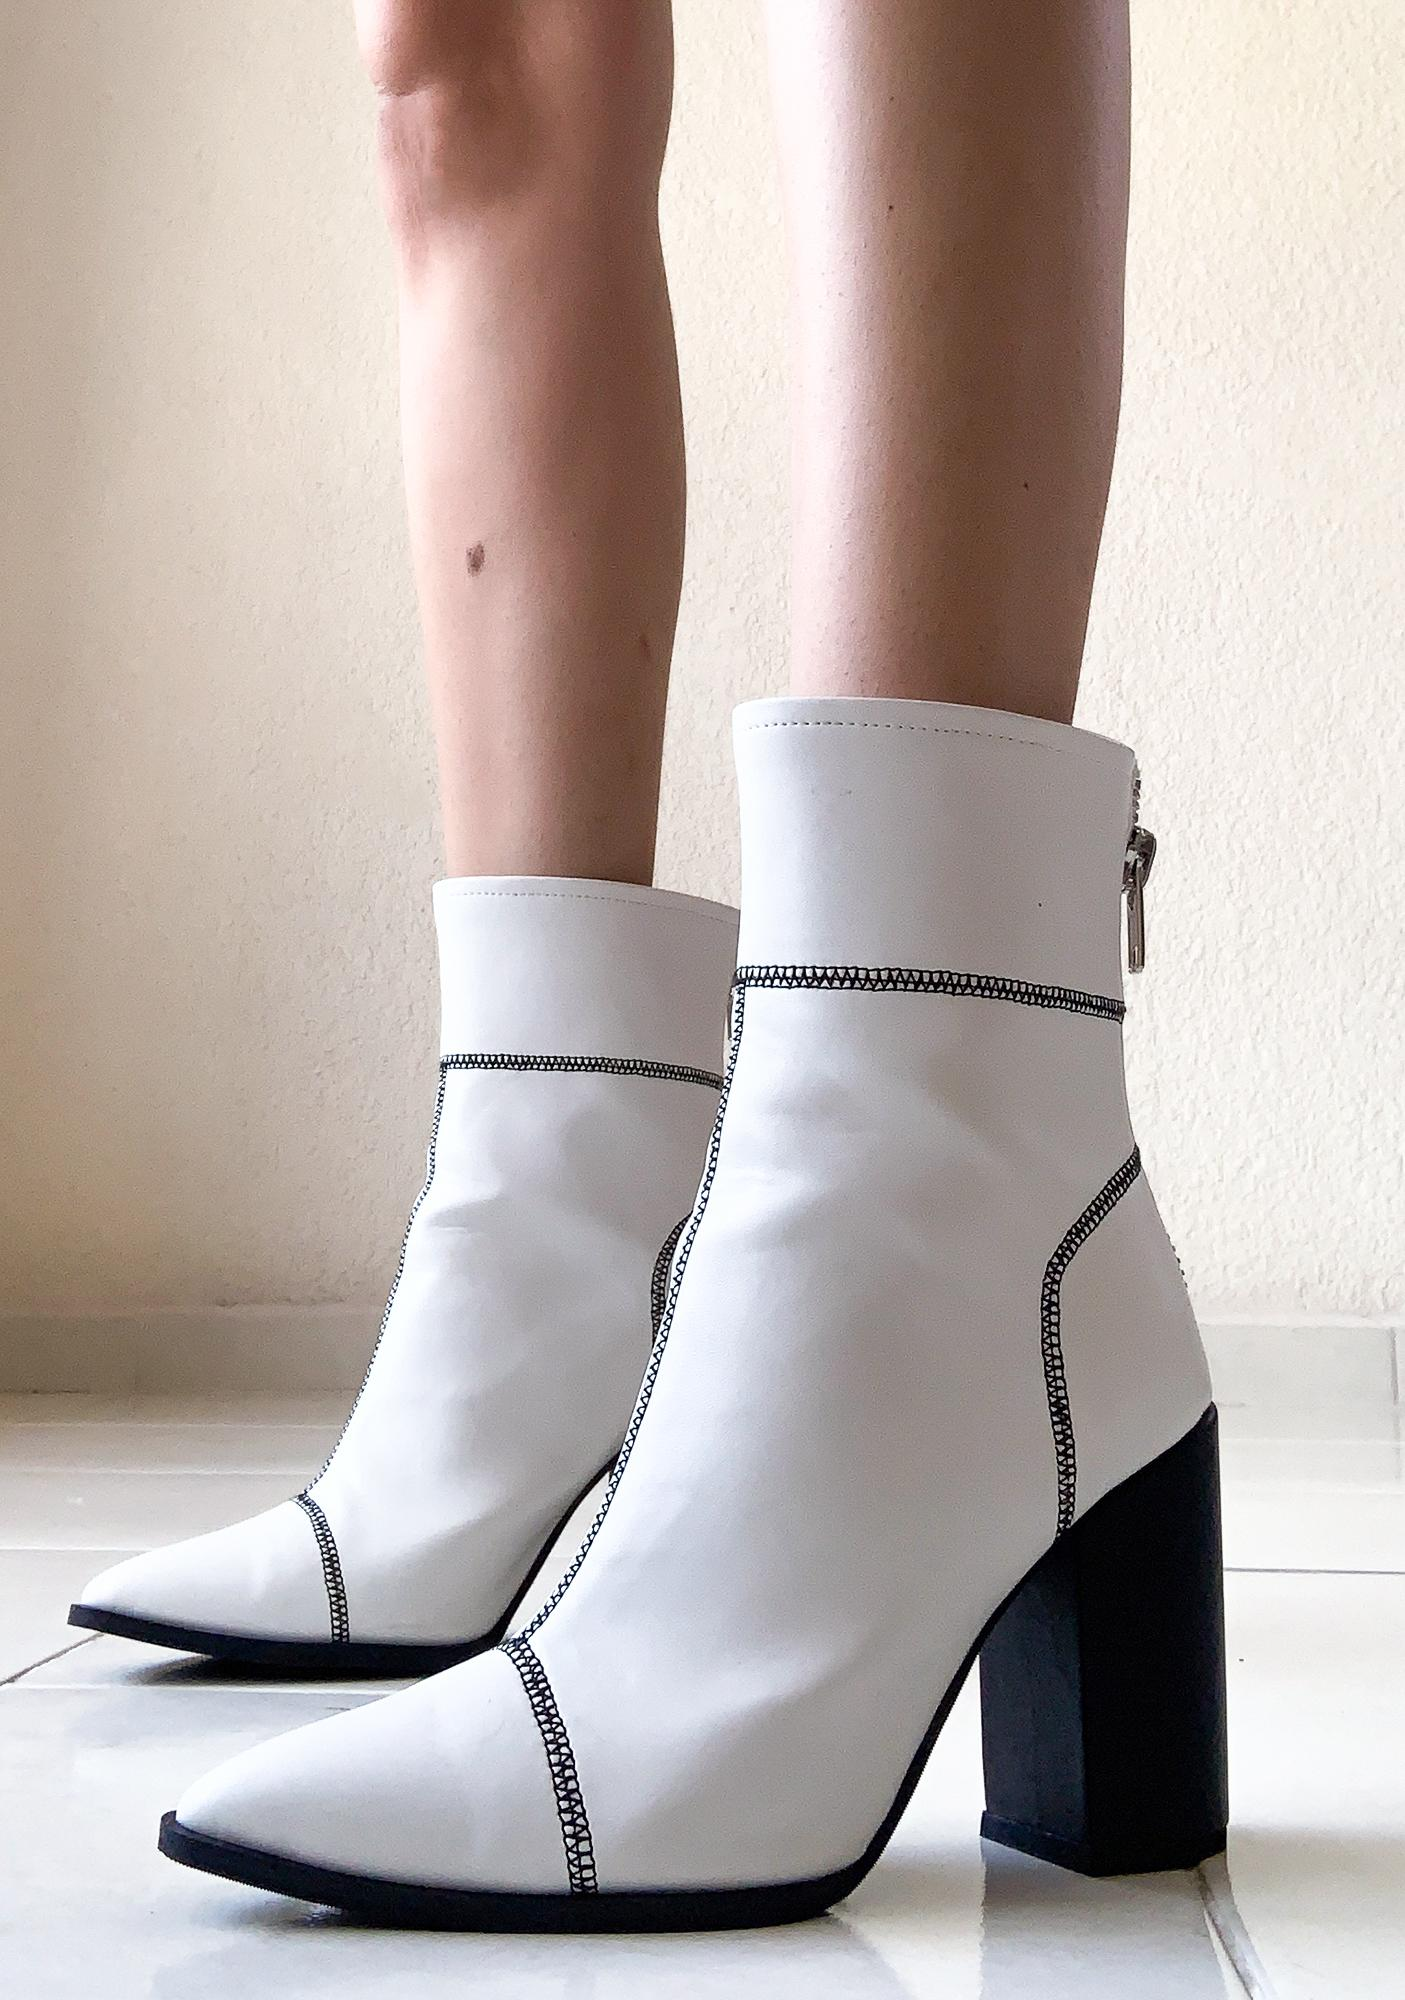 Poster Grl Money Heist Sock Boots